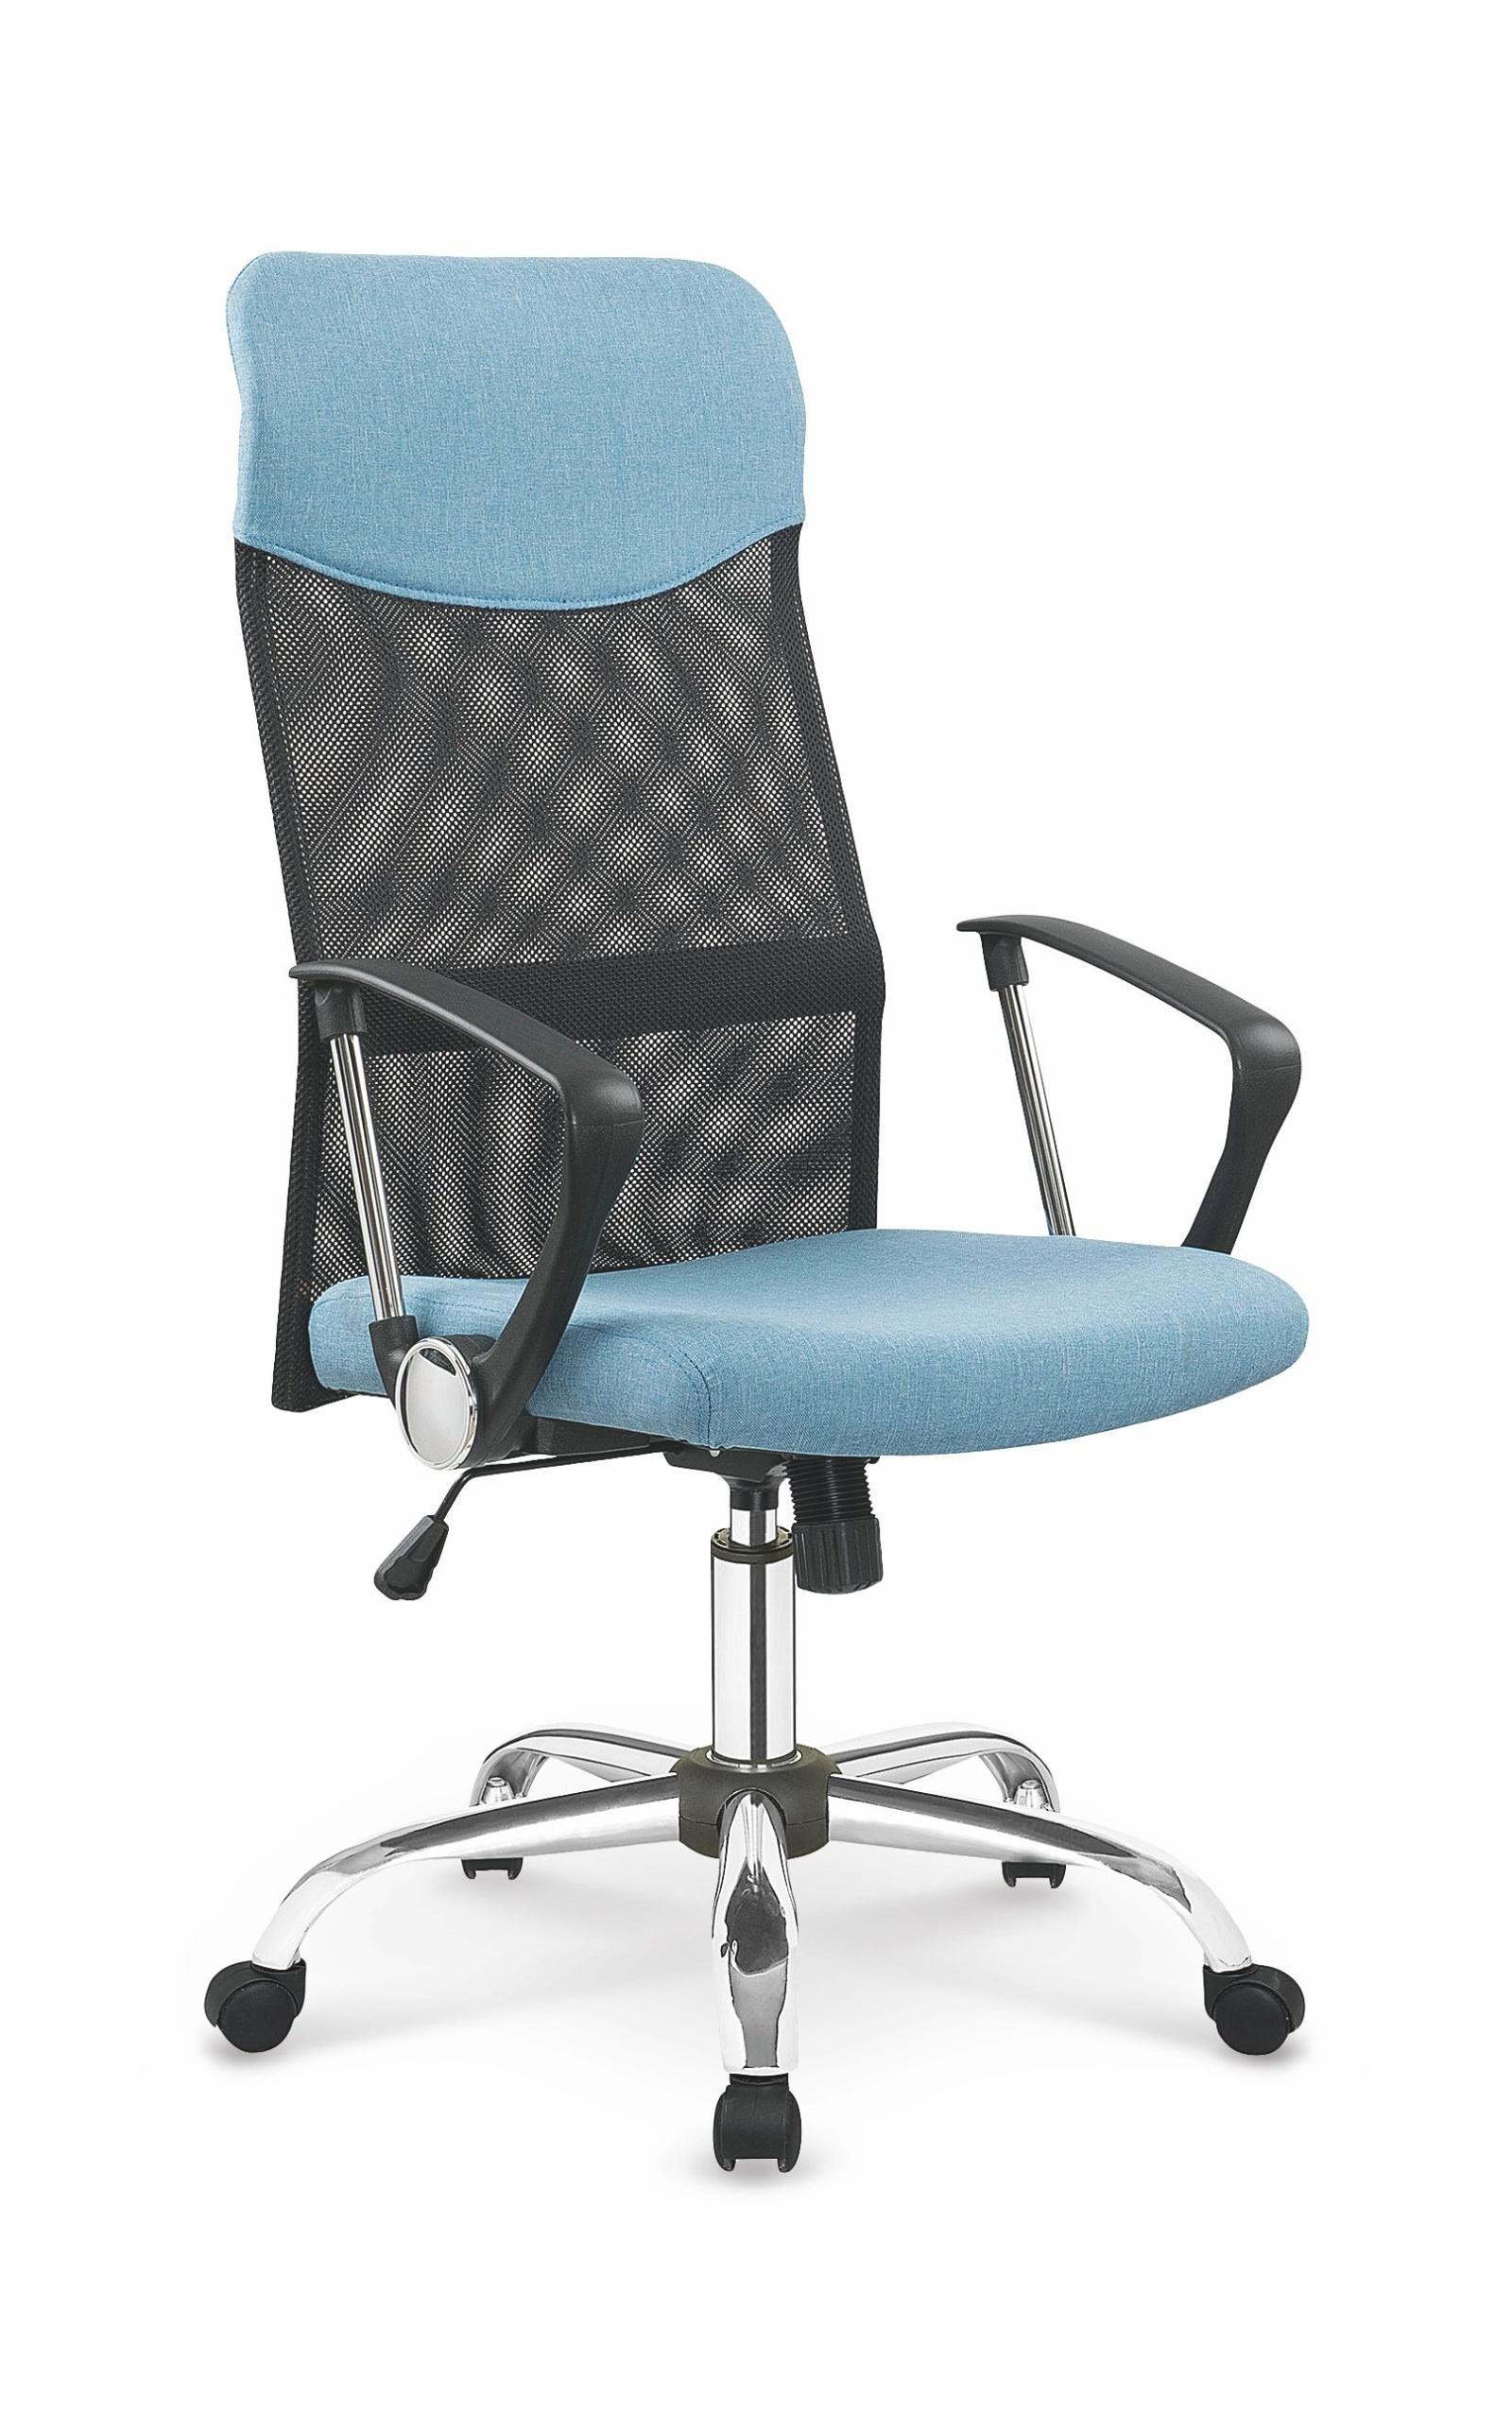 Halmar Kancelářská židle VIRE 2, modrá